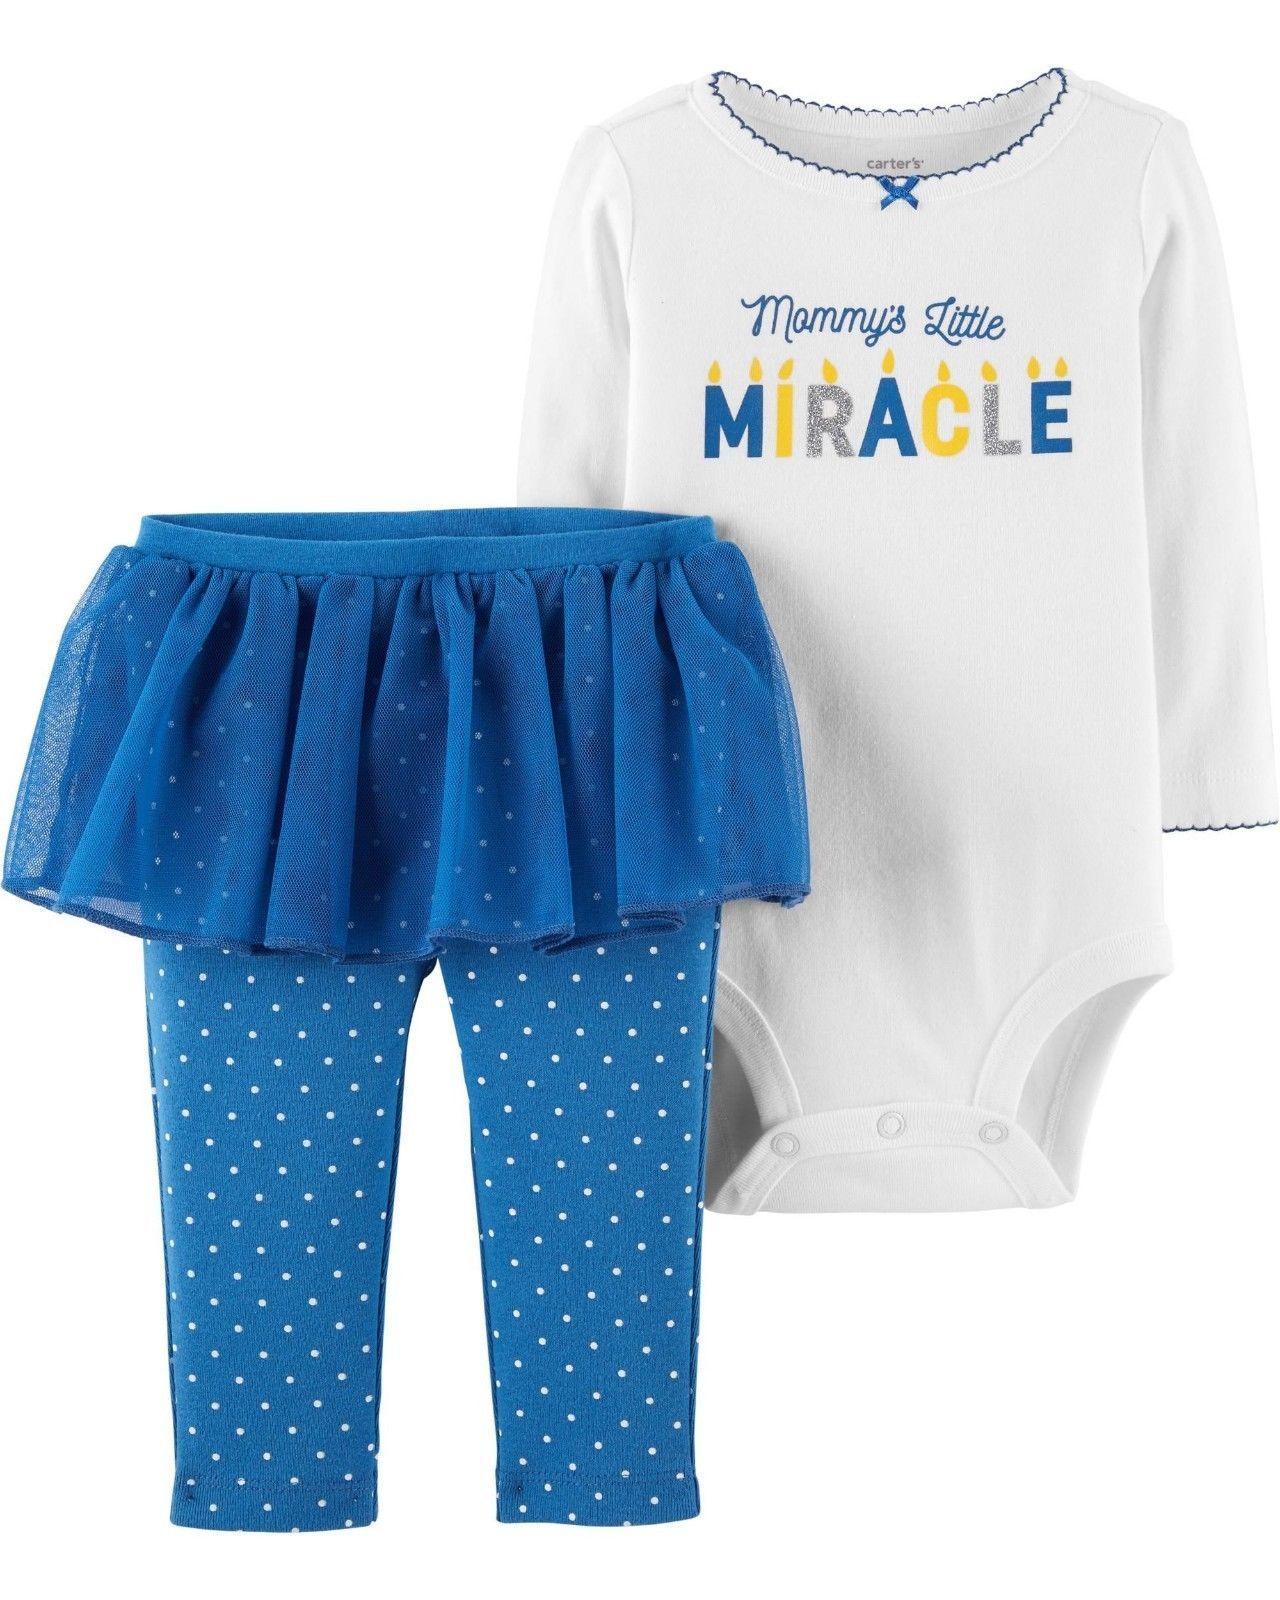 NEW NWT Carters Girls Hanukkah Set Pants Bodysuit Newborn 3 6 9 12 18 24 Months